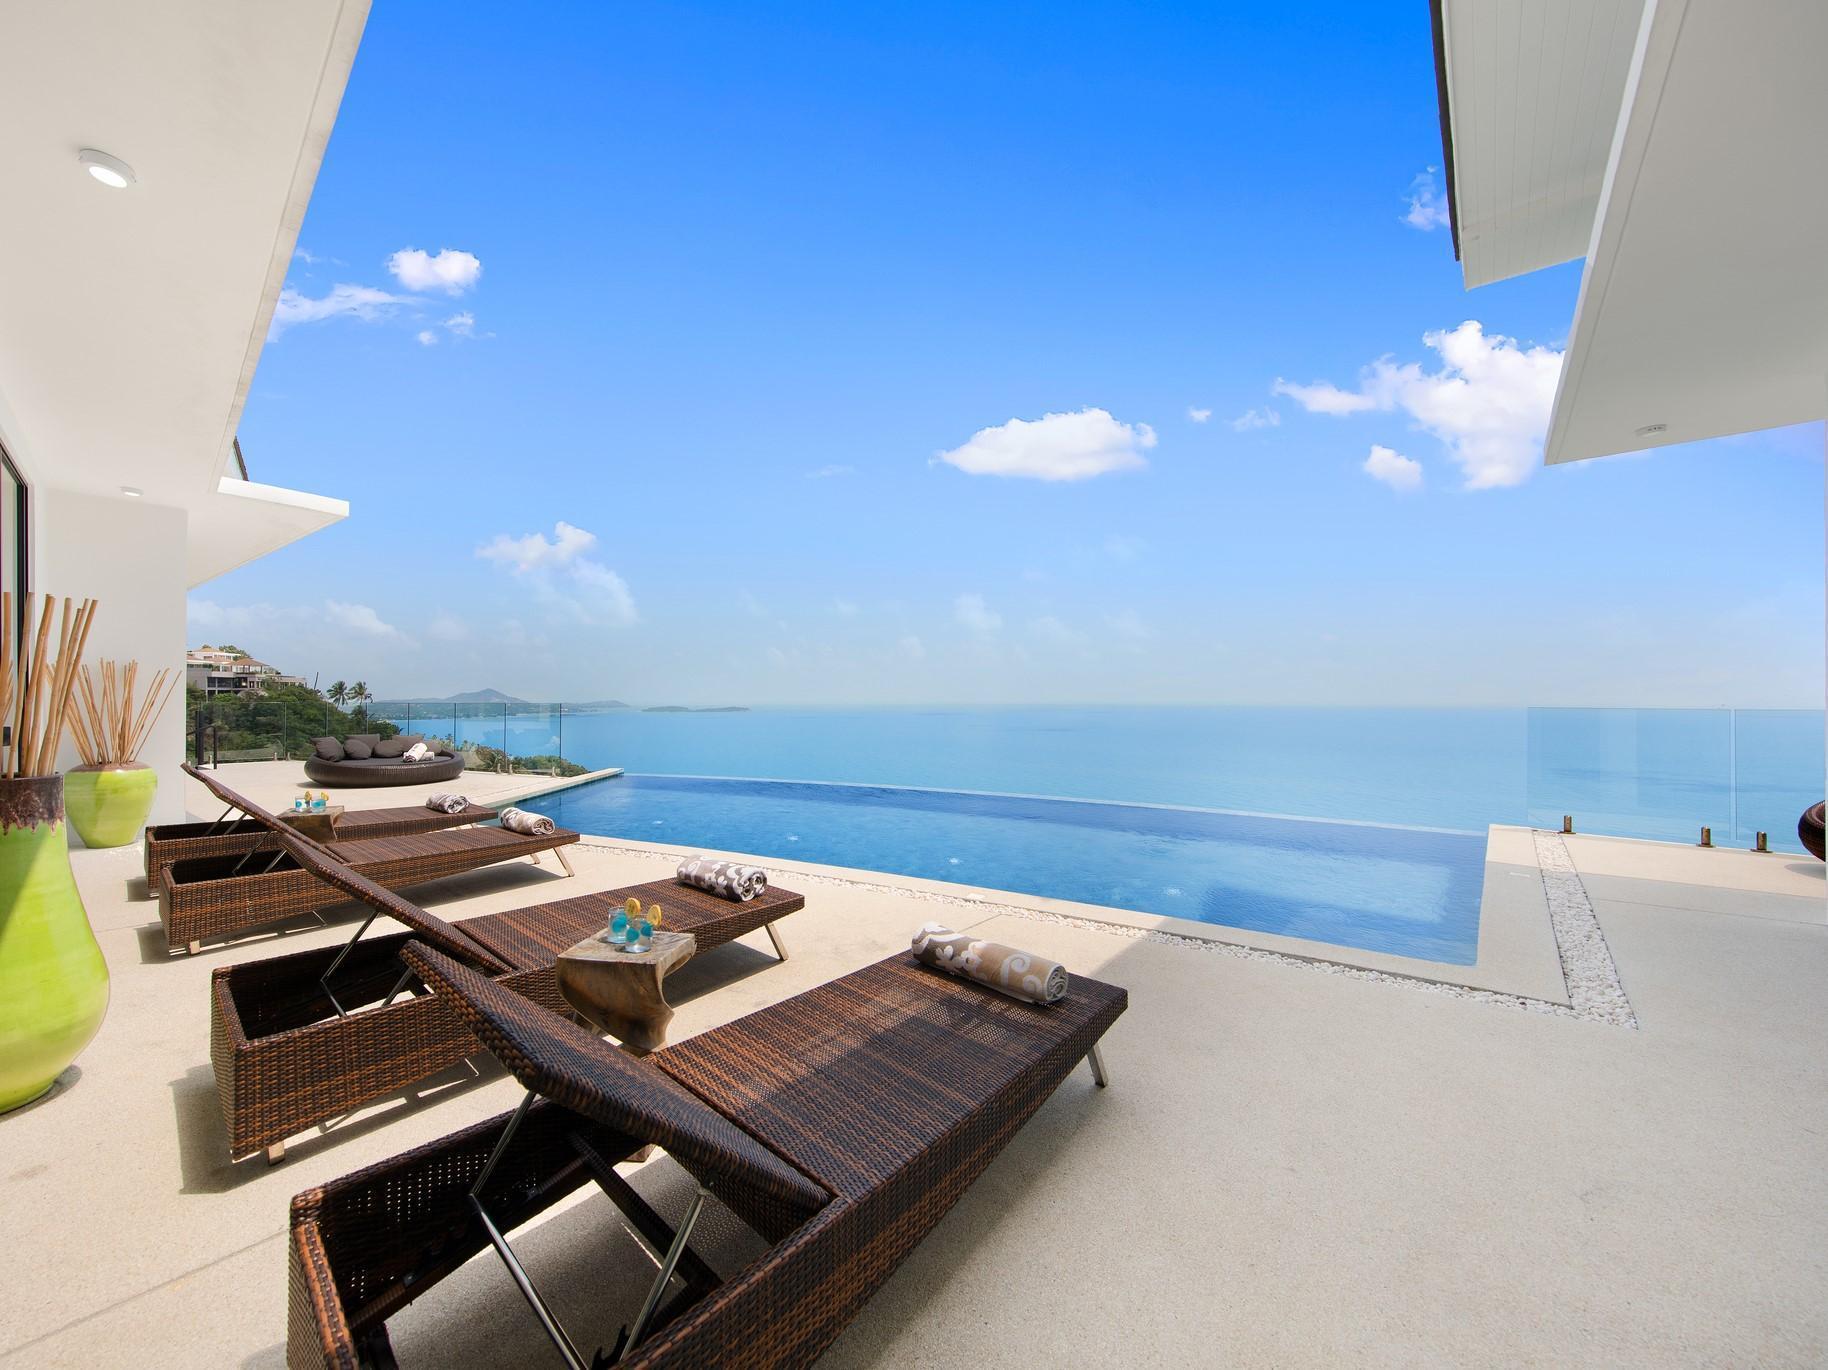 Luxurious Sunny Moon Villa - 10 Rooms - 20 Guests วิลลา 10 ห้องนอน 10 ห้องน้ำส่วนตัว ขนาด 930 ตร.ม. – เฉวงน้อย